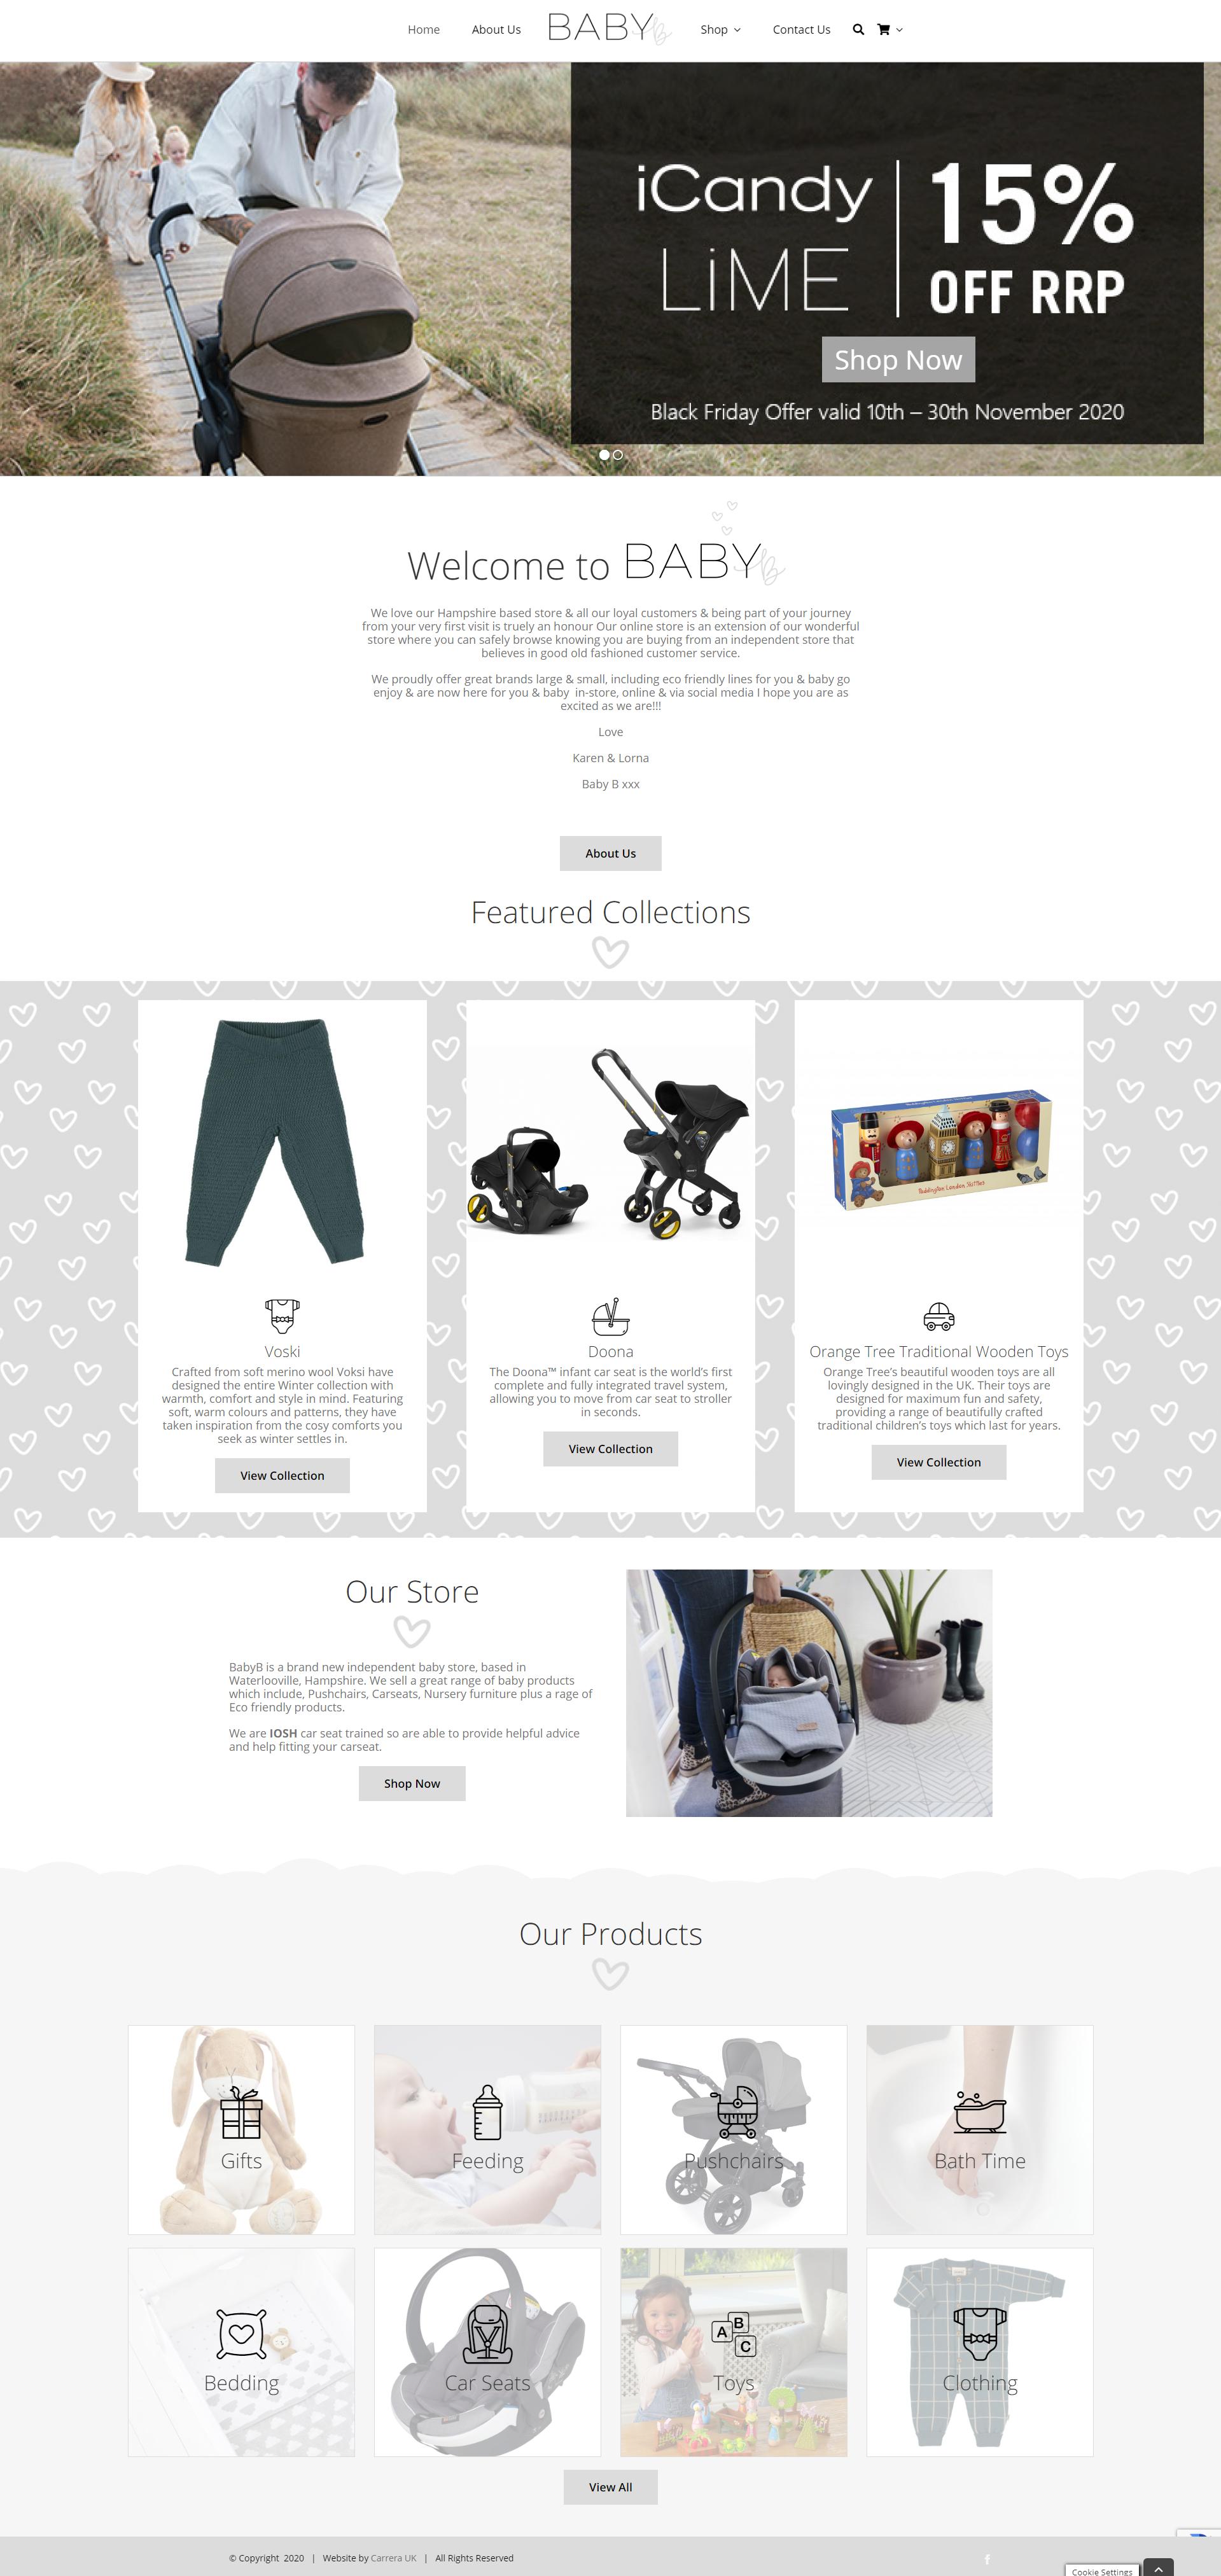 Baby B Store ecommerce Website Designed by Carrera UK